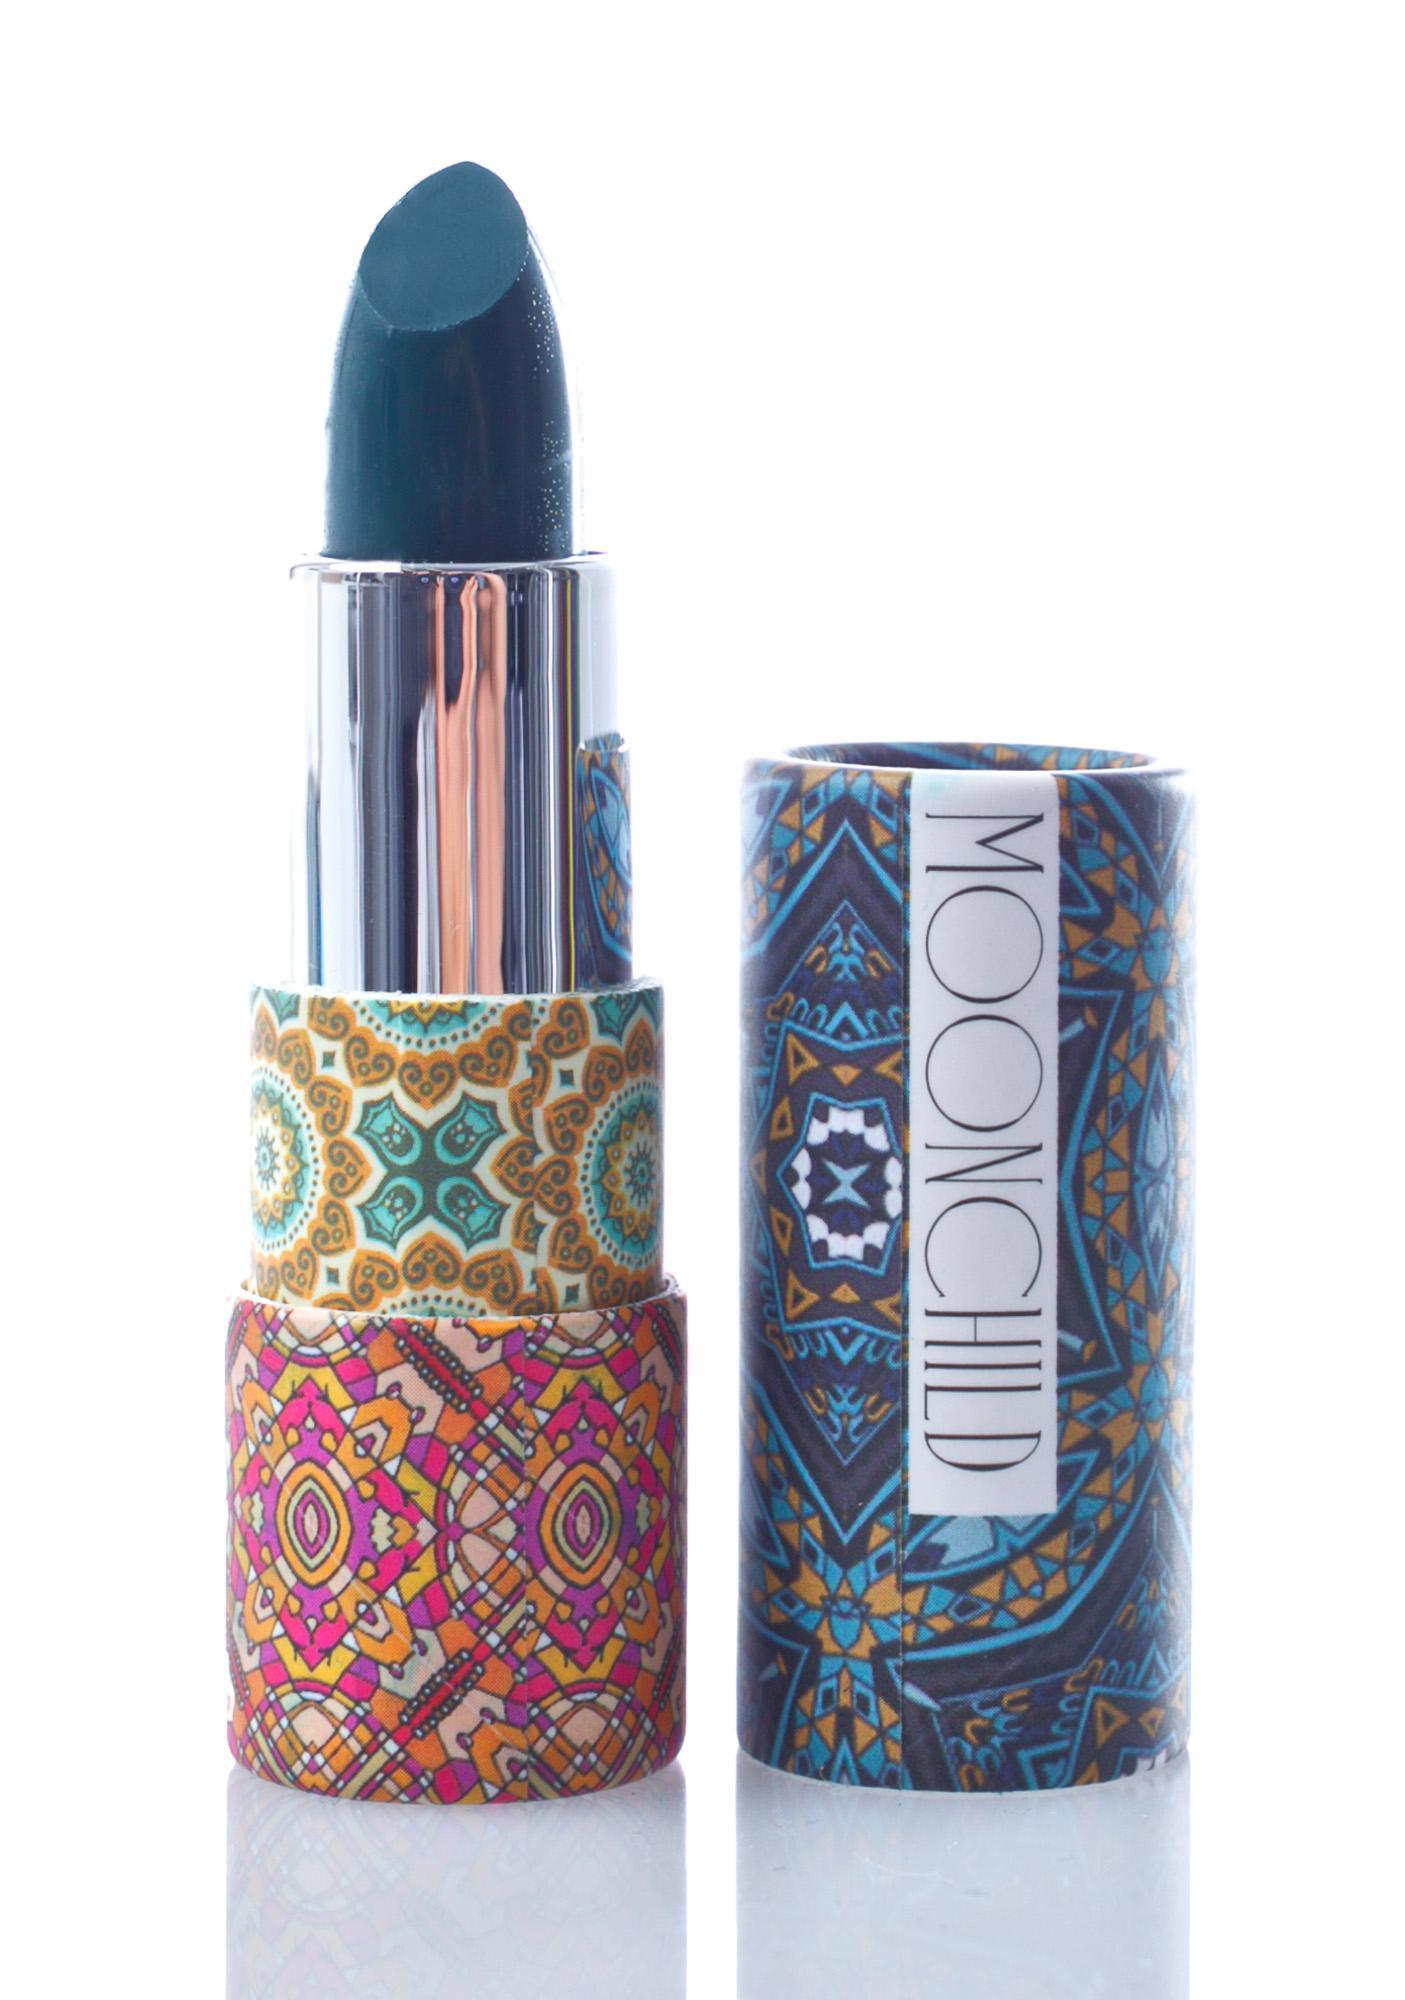 Moonchild Lipstick Eccentric Lipstick